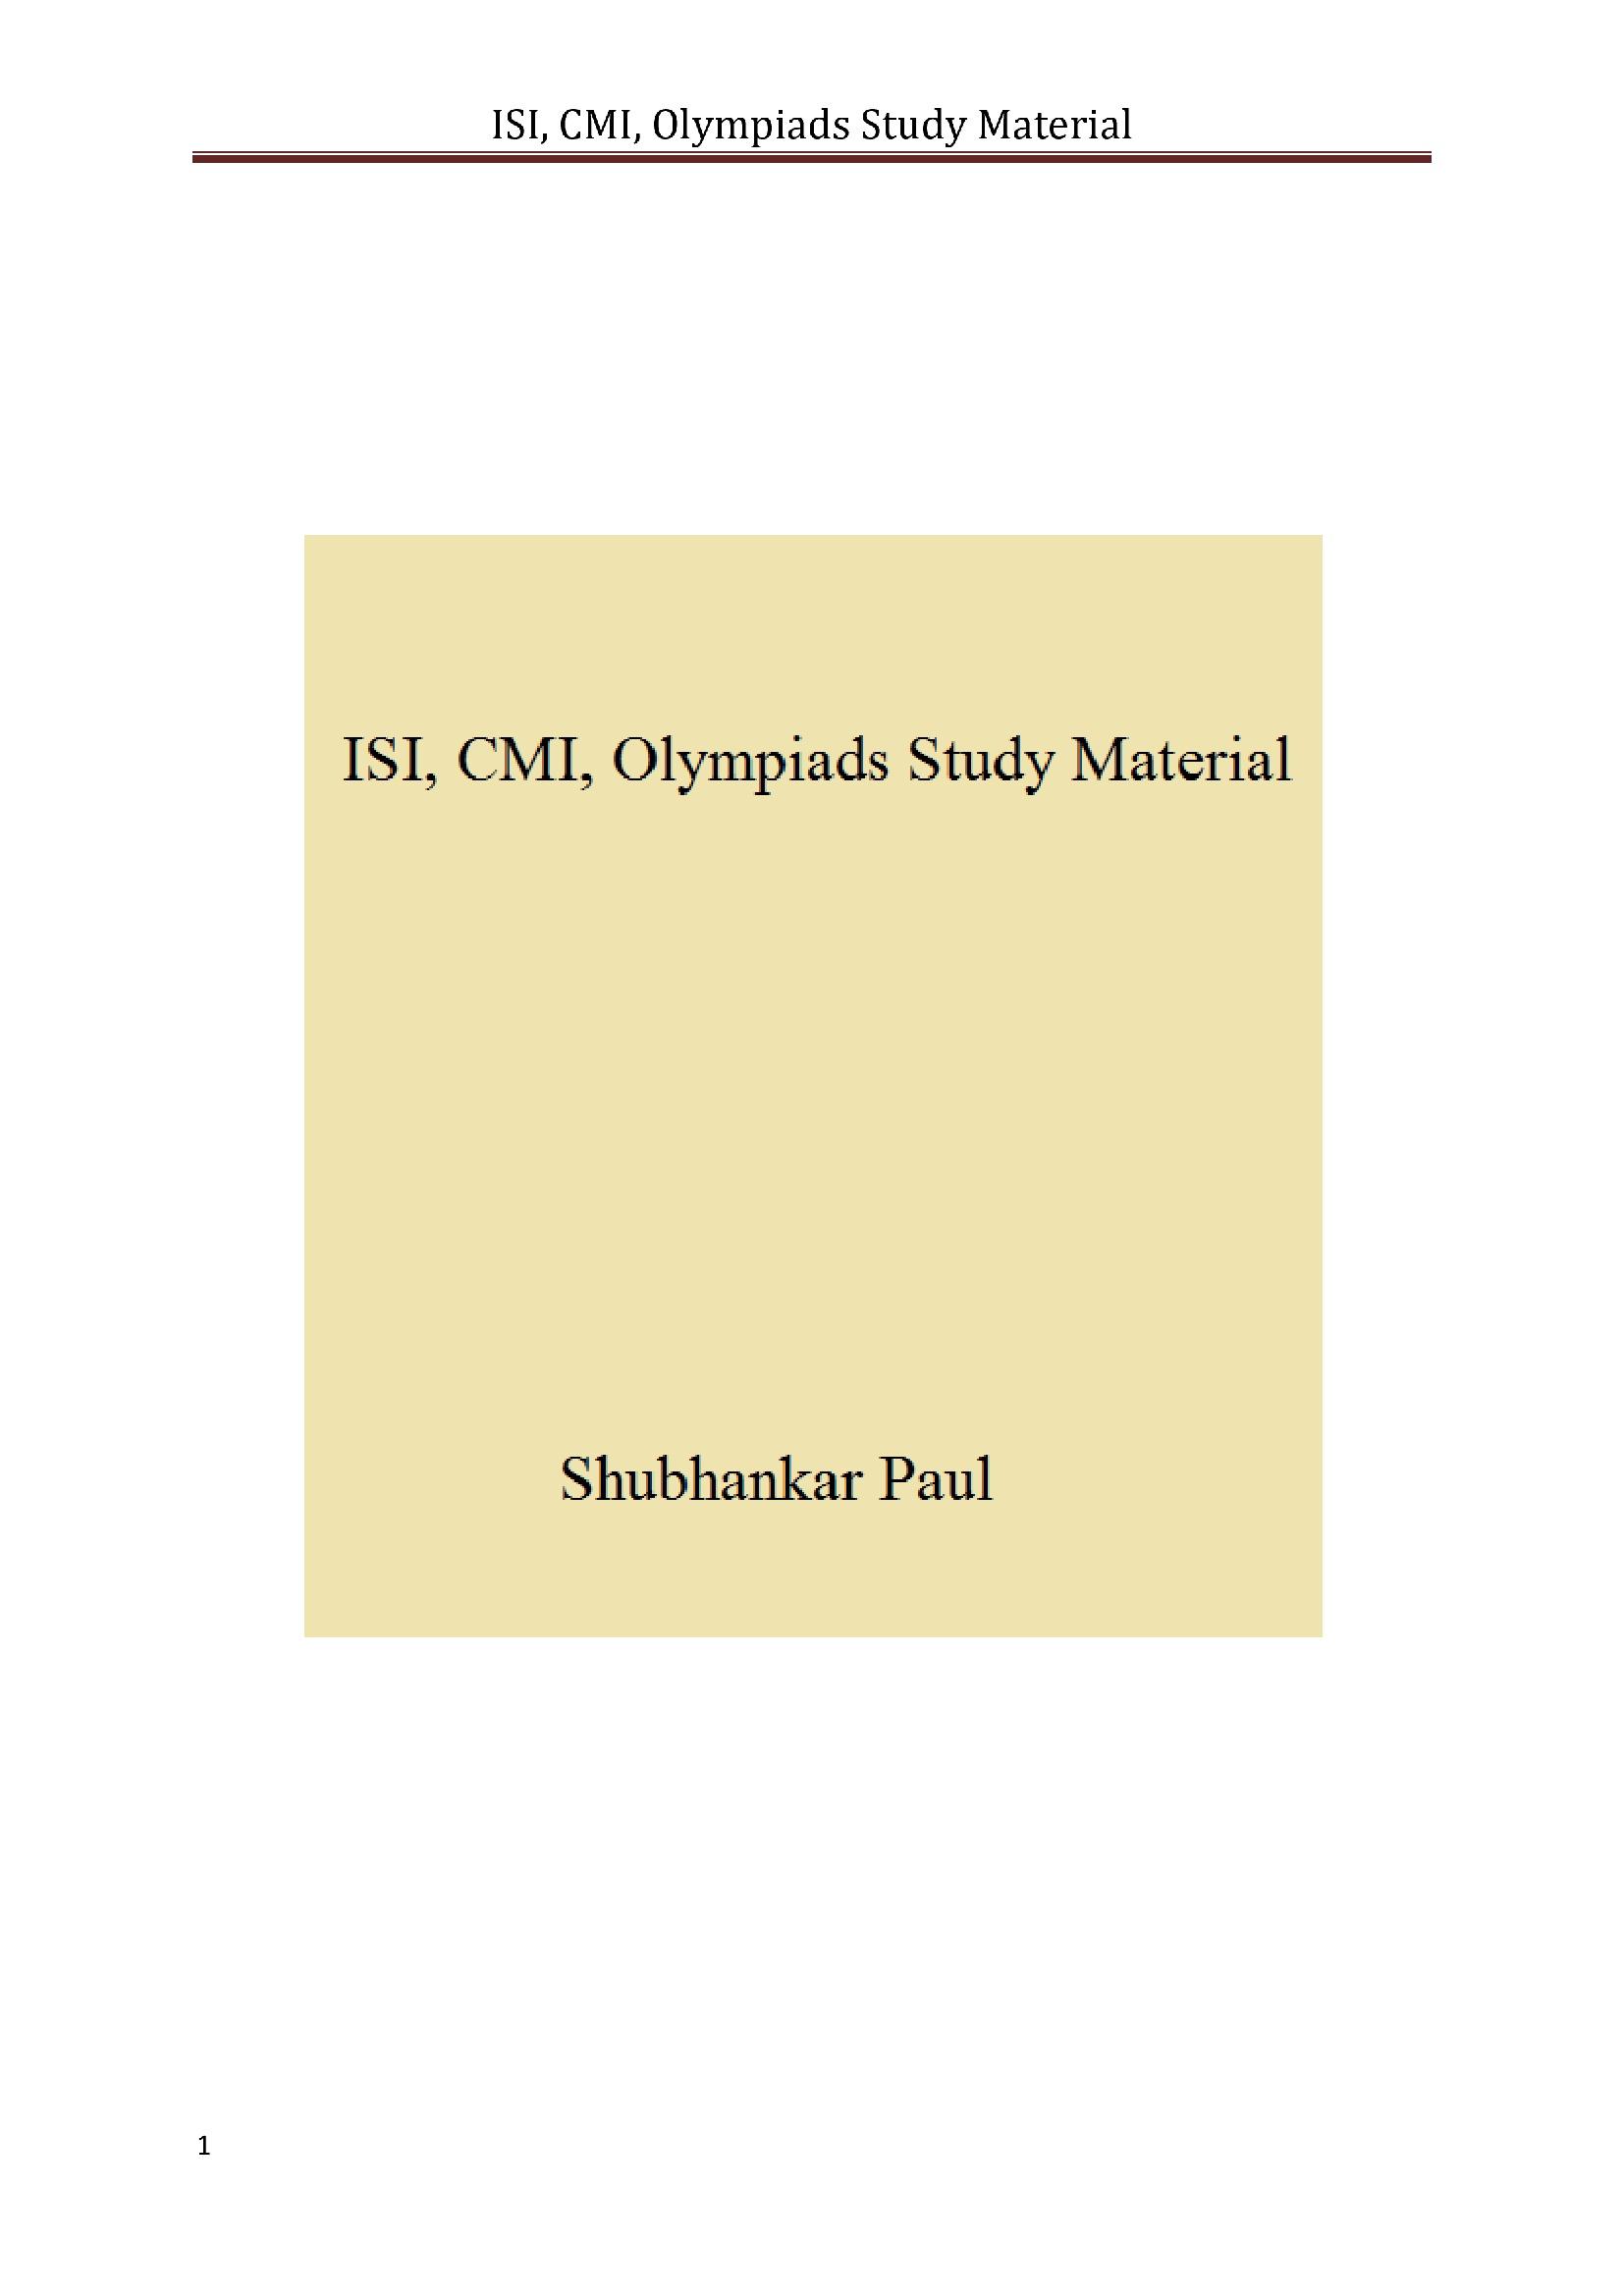 ISI, CMI, Olympiads Study Material (eBook) eBook   Pothi com